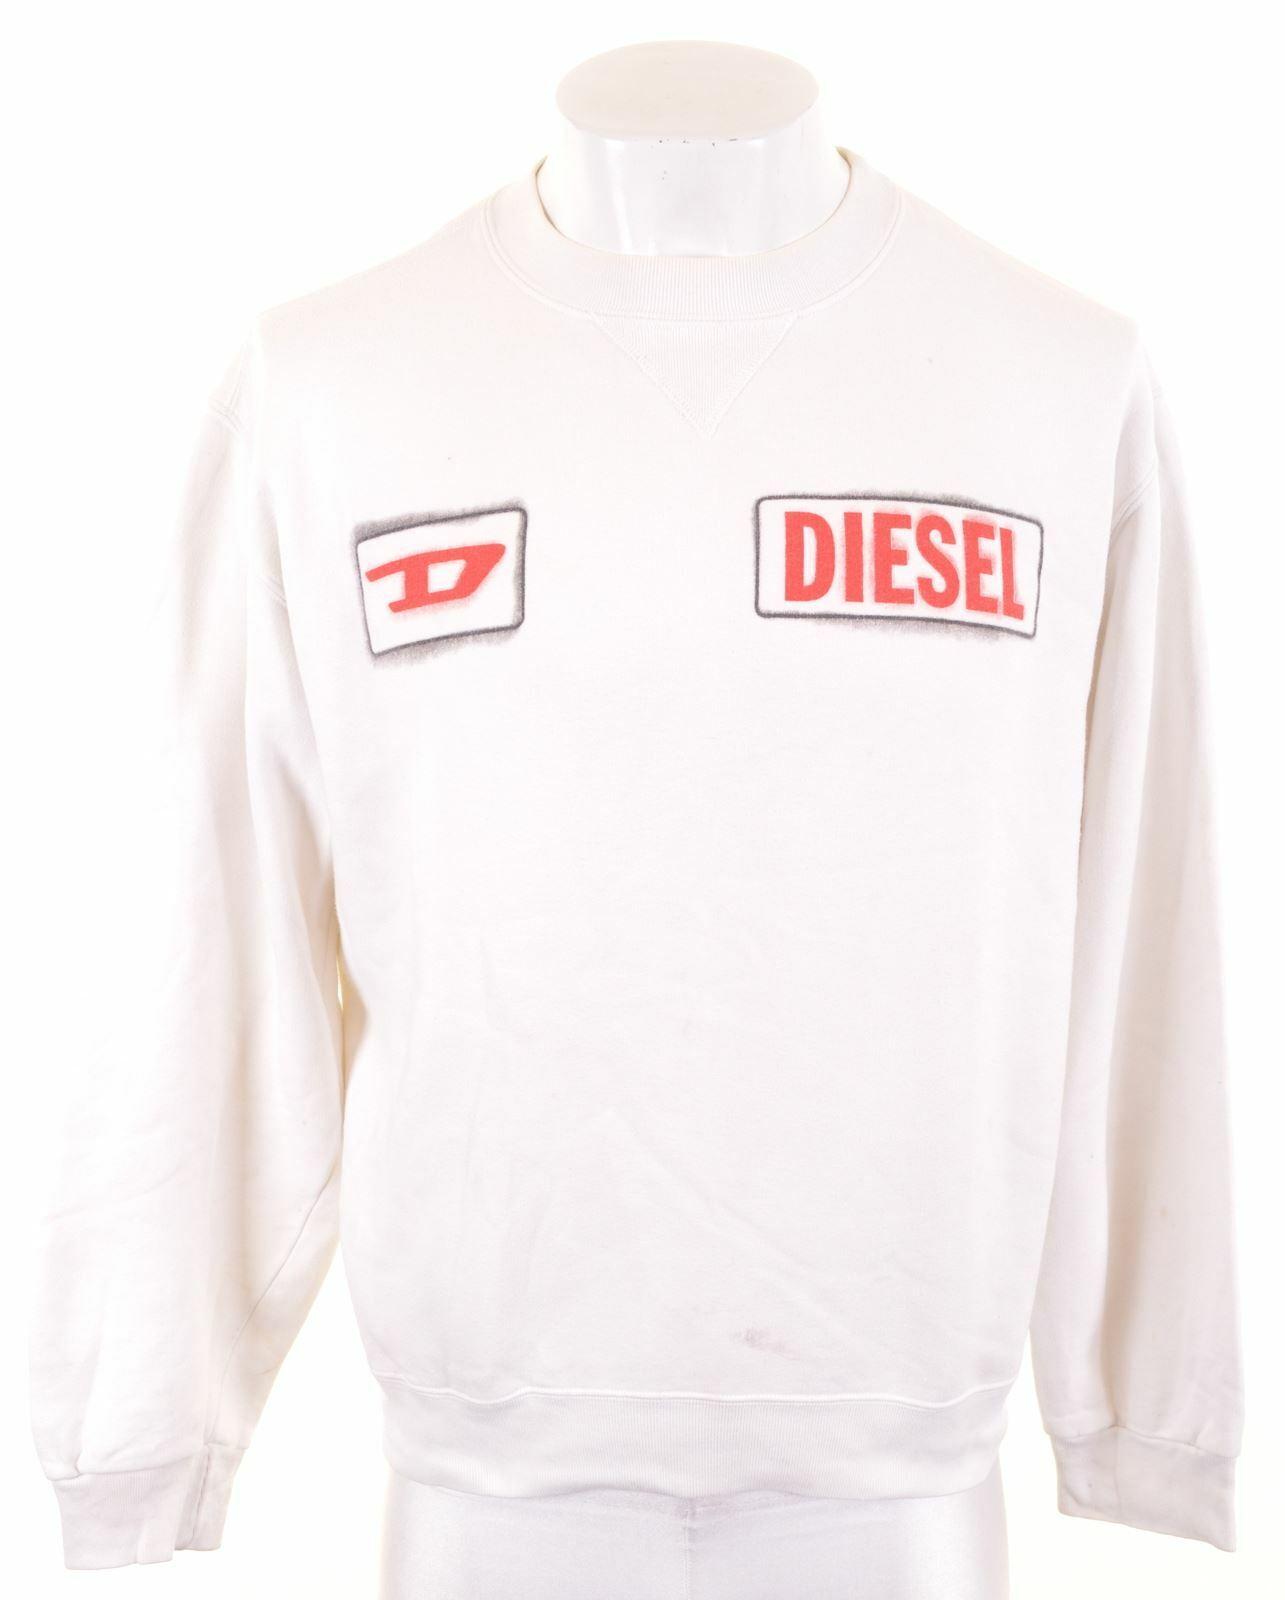 DIESEL Mens Sweatshirt Jumper Large White Cotton JZ16